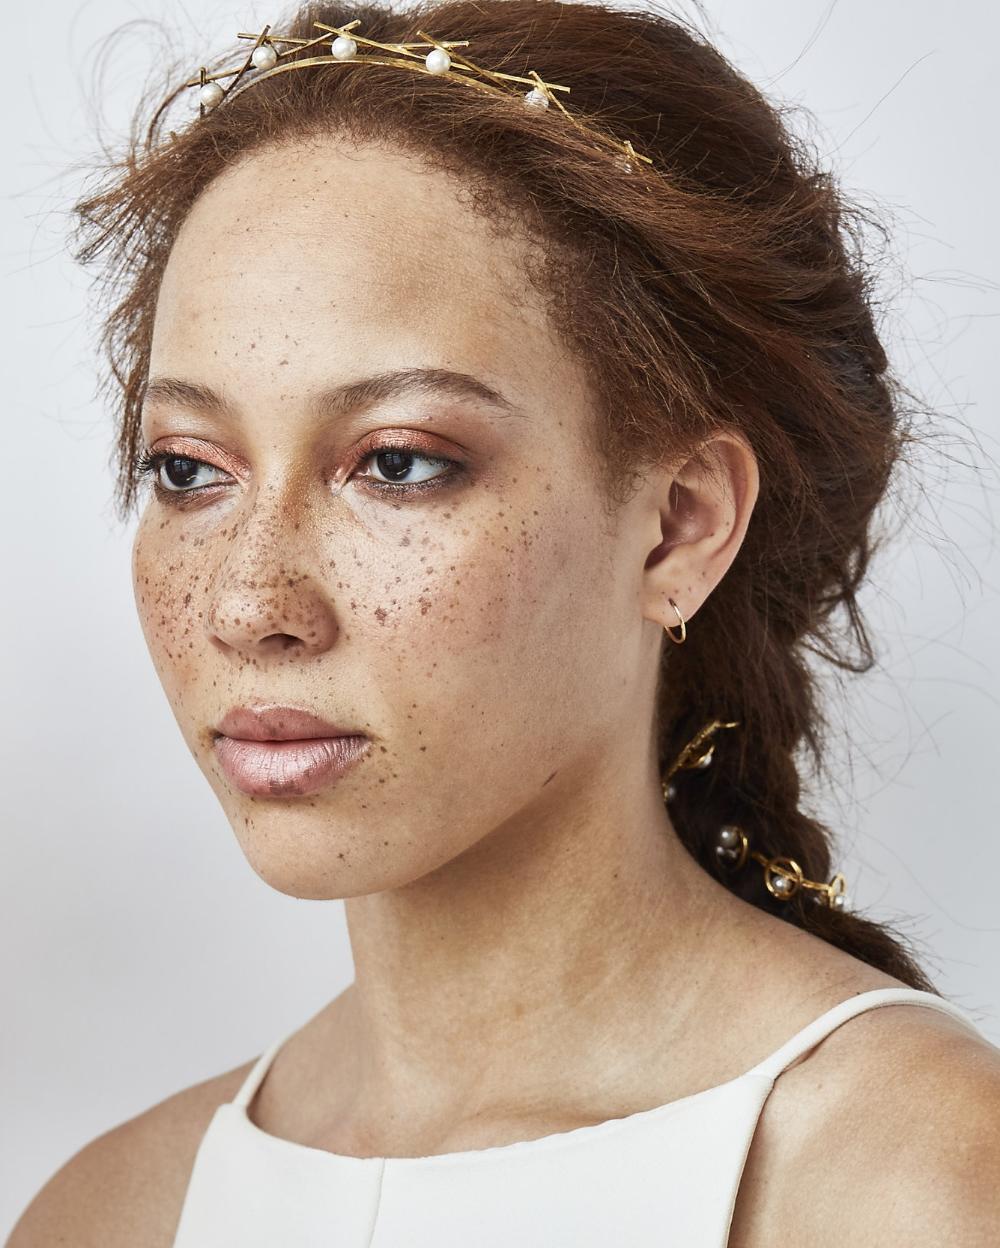 Da Vinci Wedding Gowns: Da Vinci Pearl Headband In 2020 (With Images)